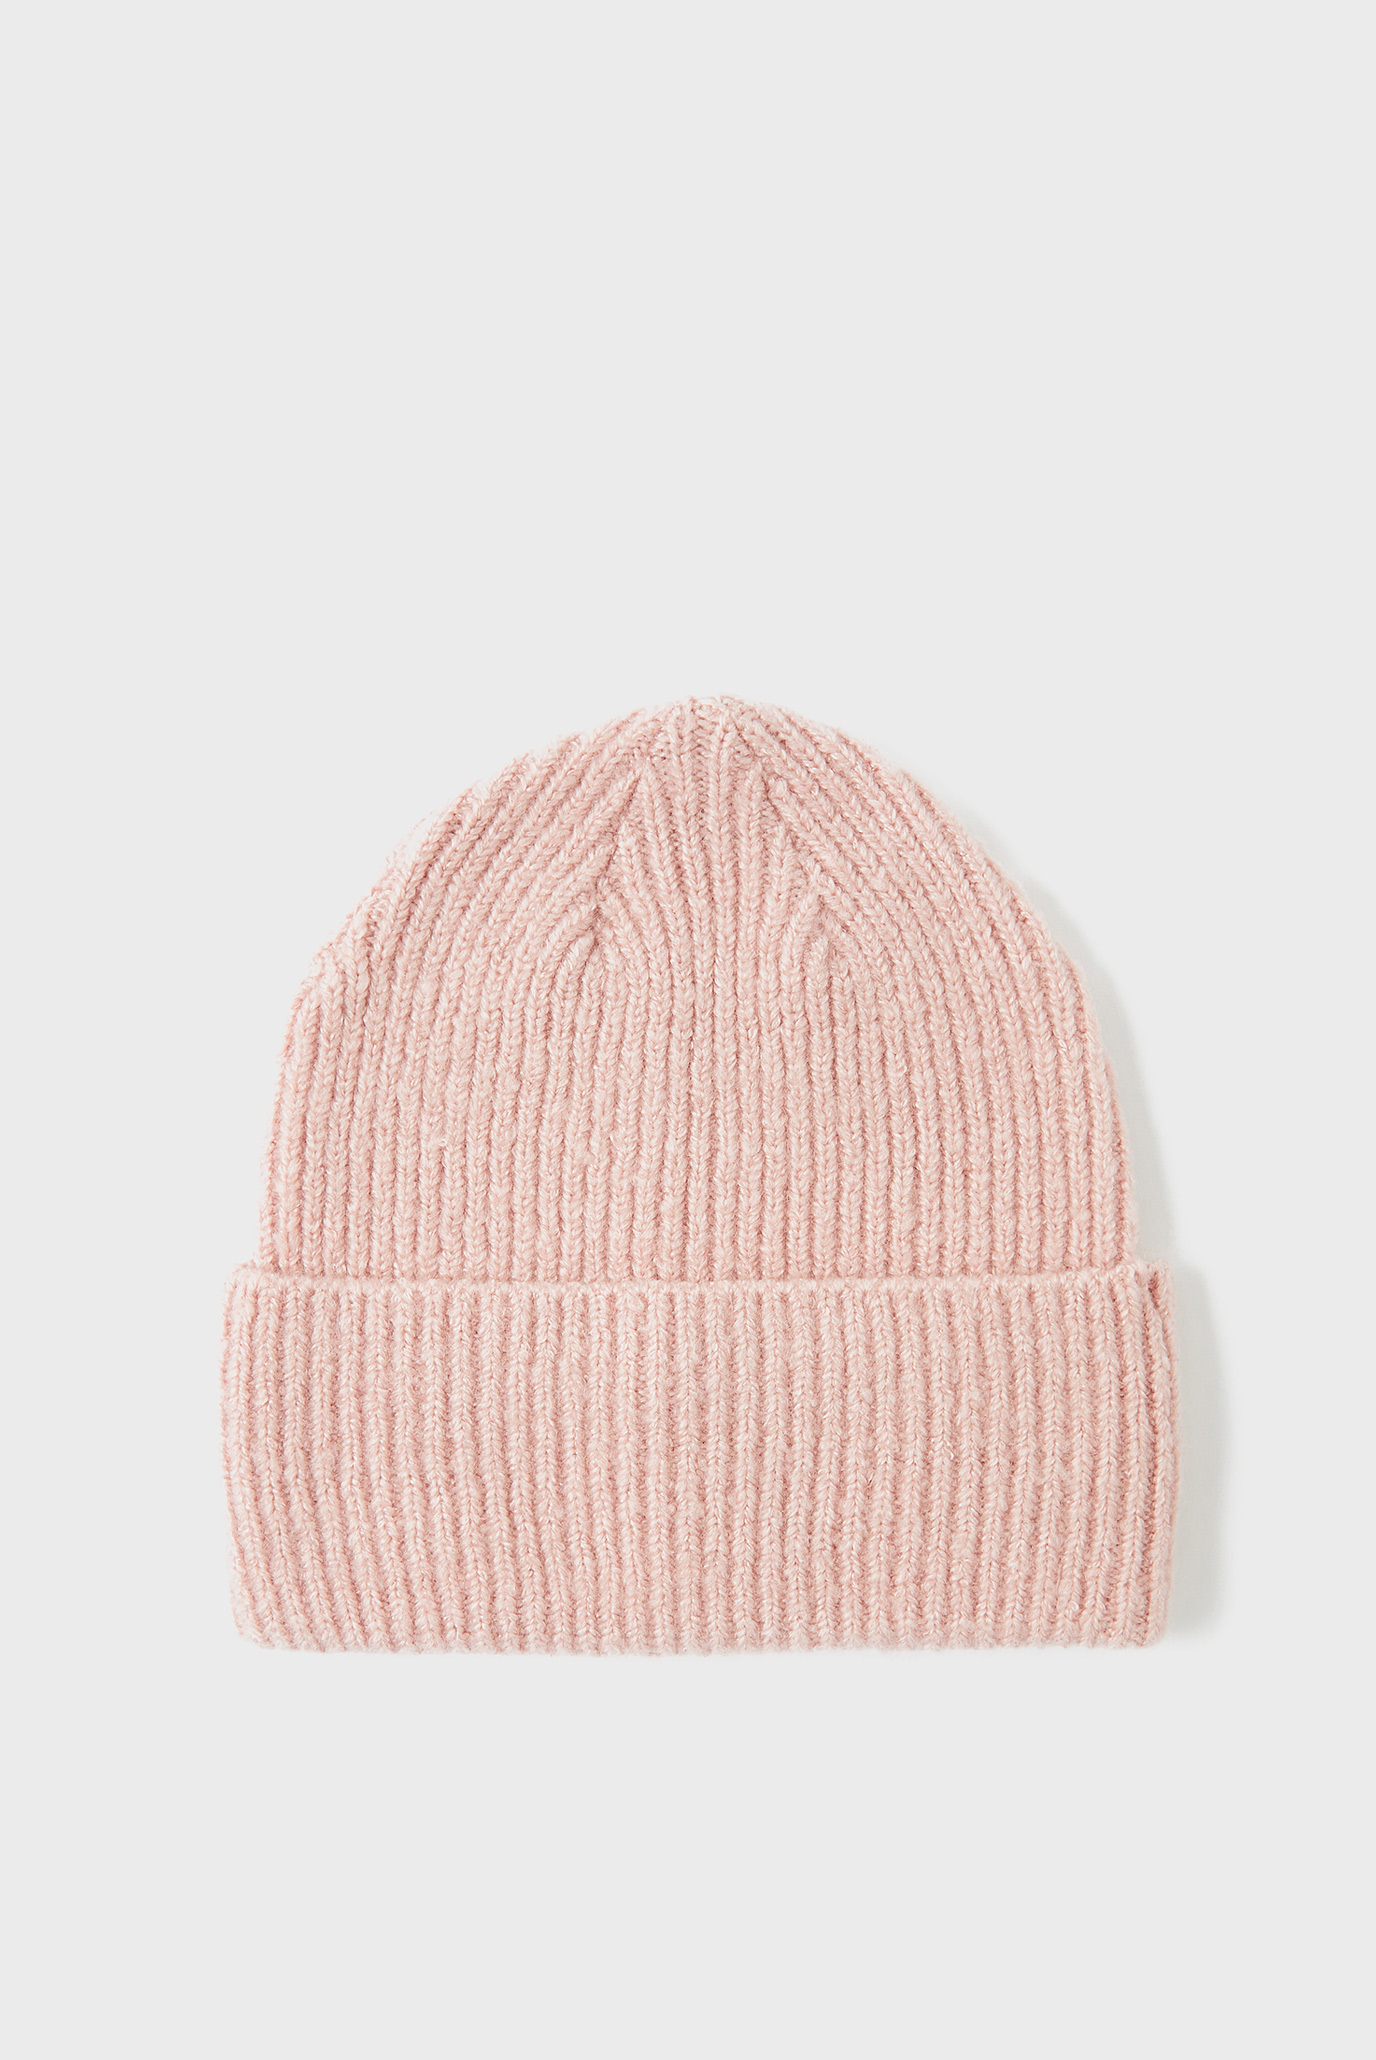 Жіноча рожева шапка SOHO SOFT BEANIE 1